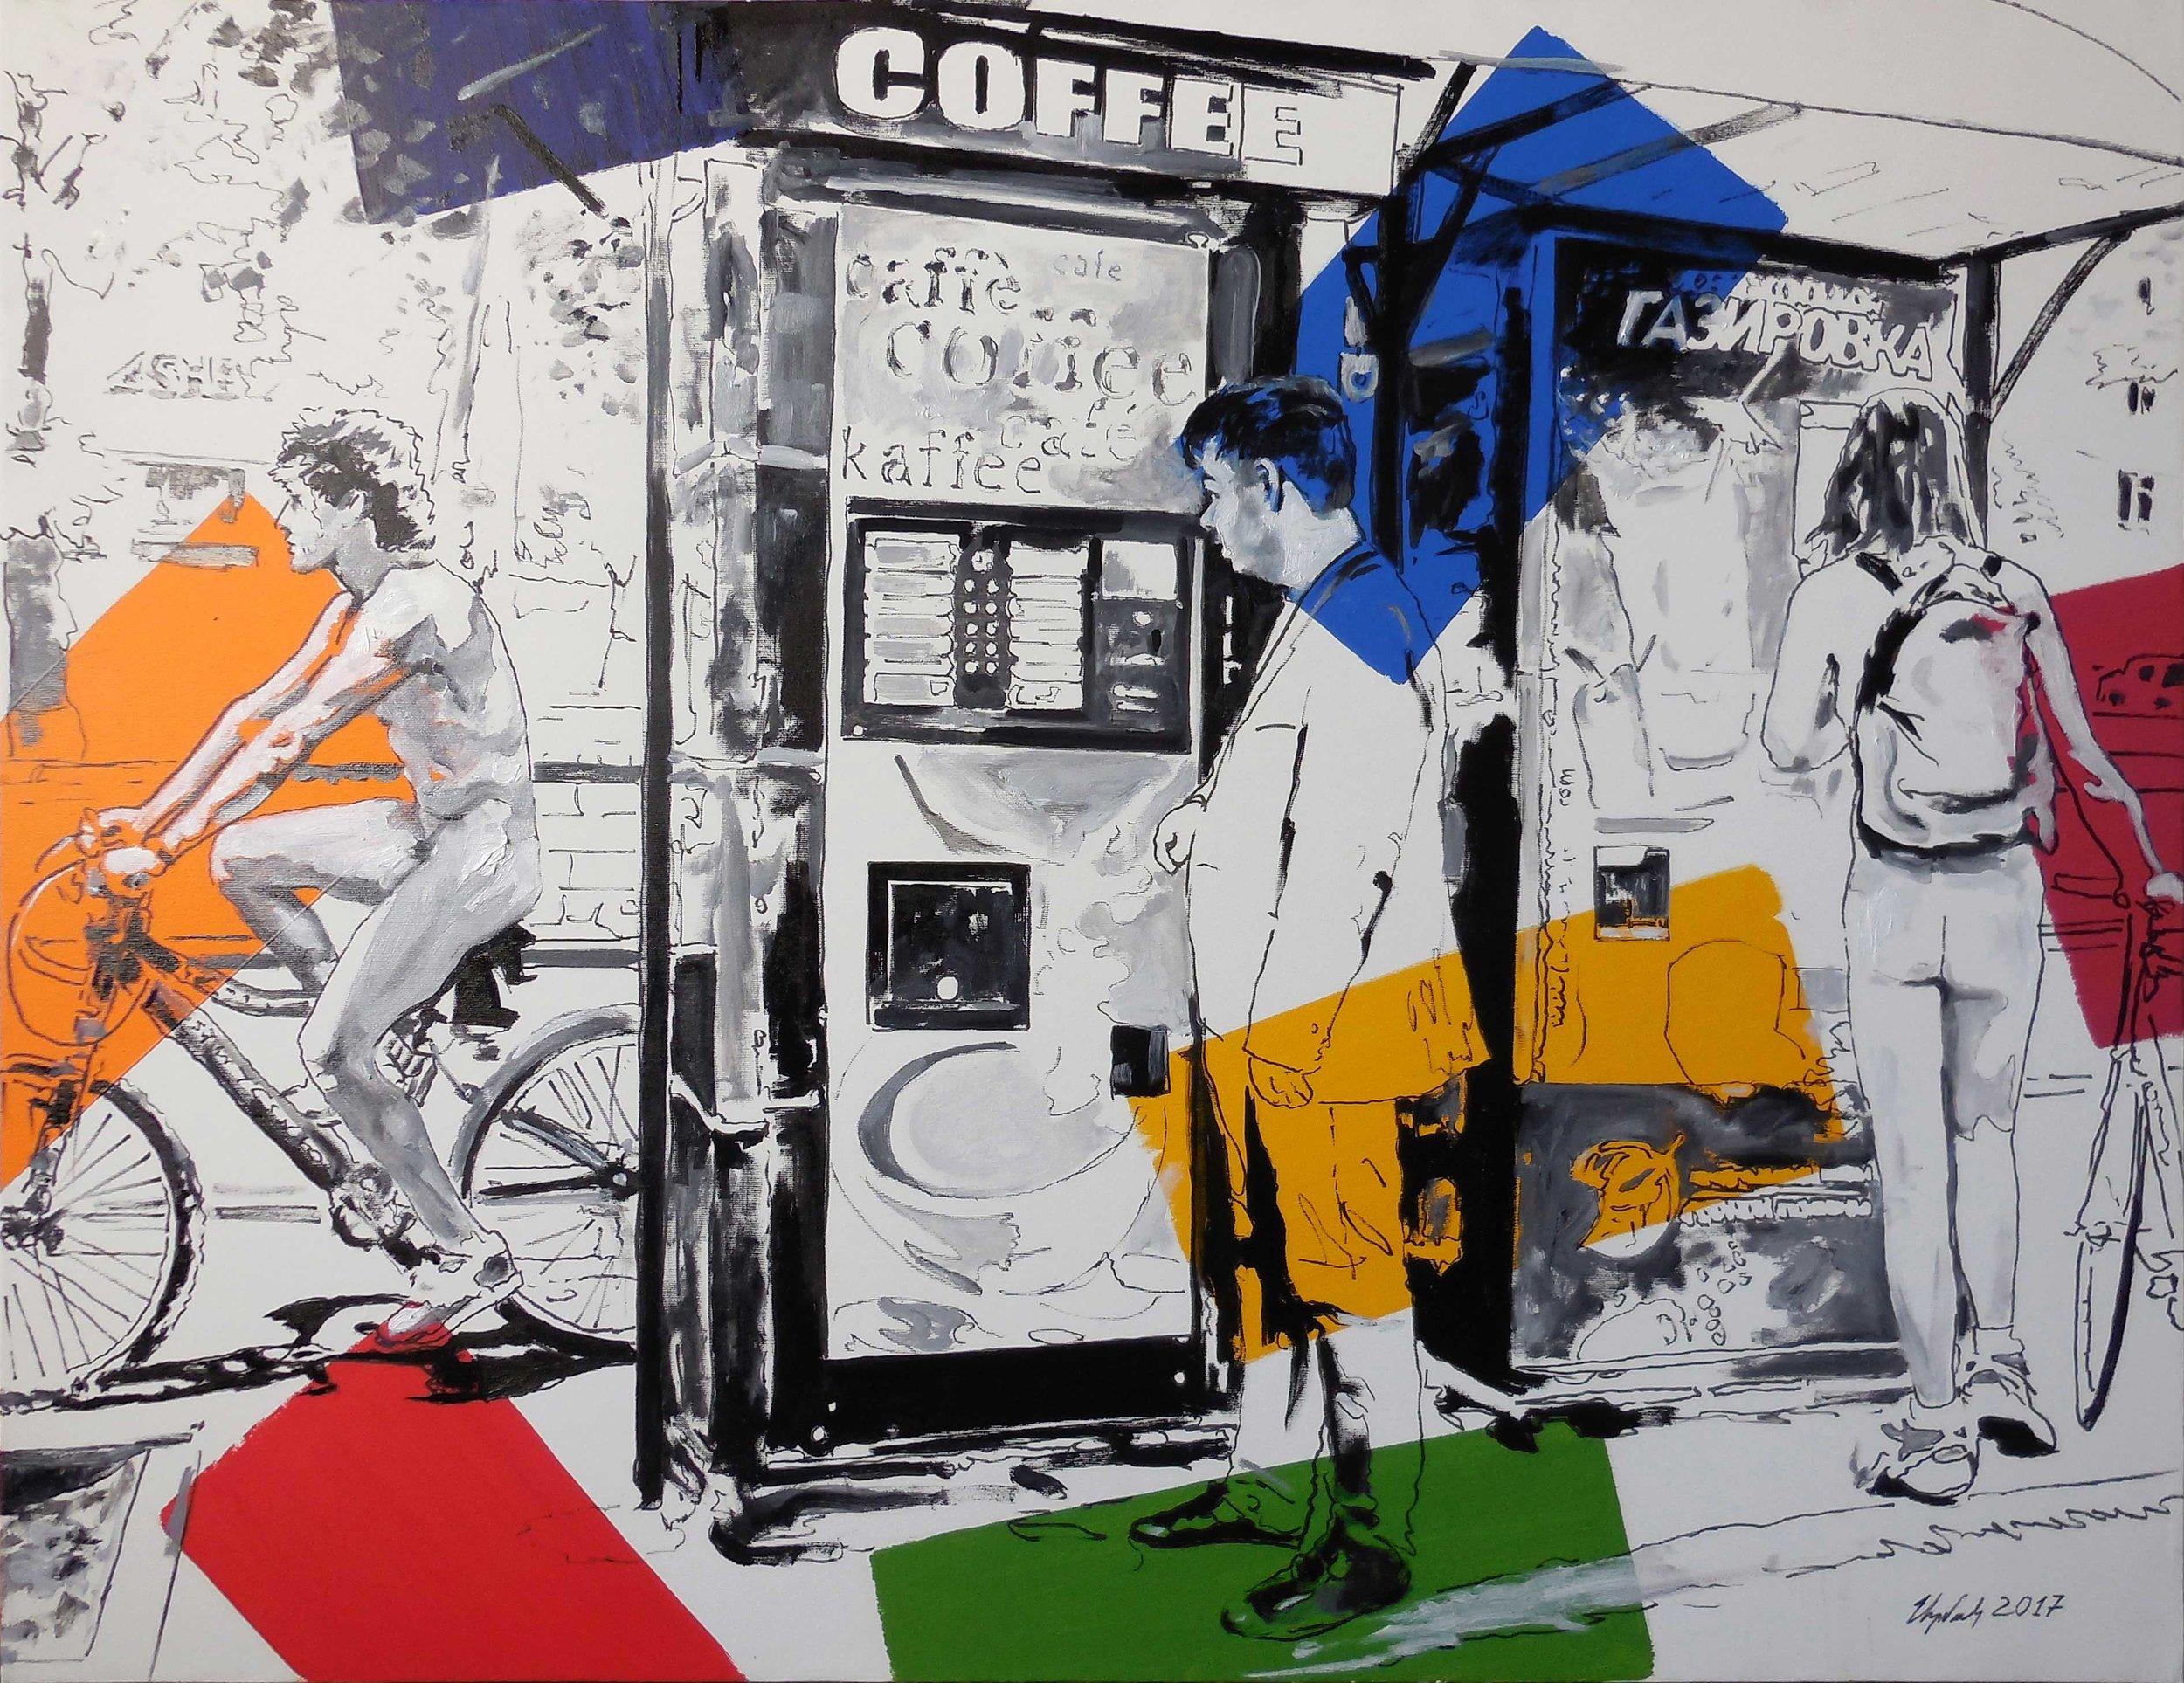 Кофе-машина в Капане, 2017